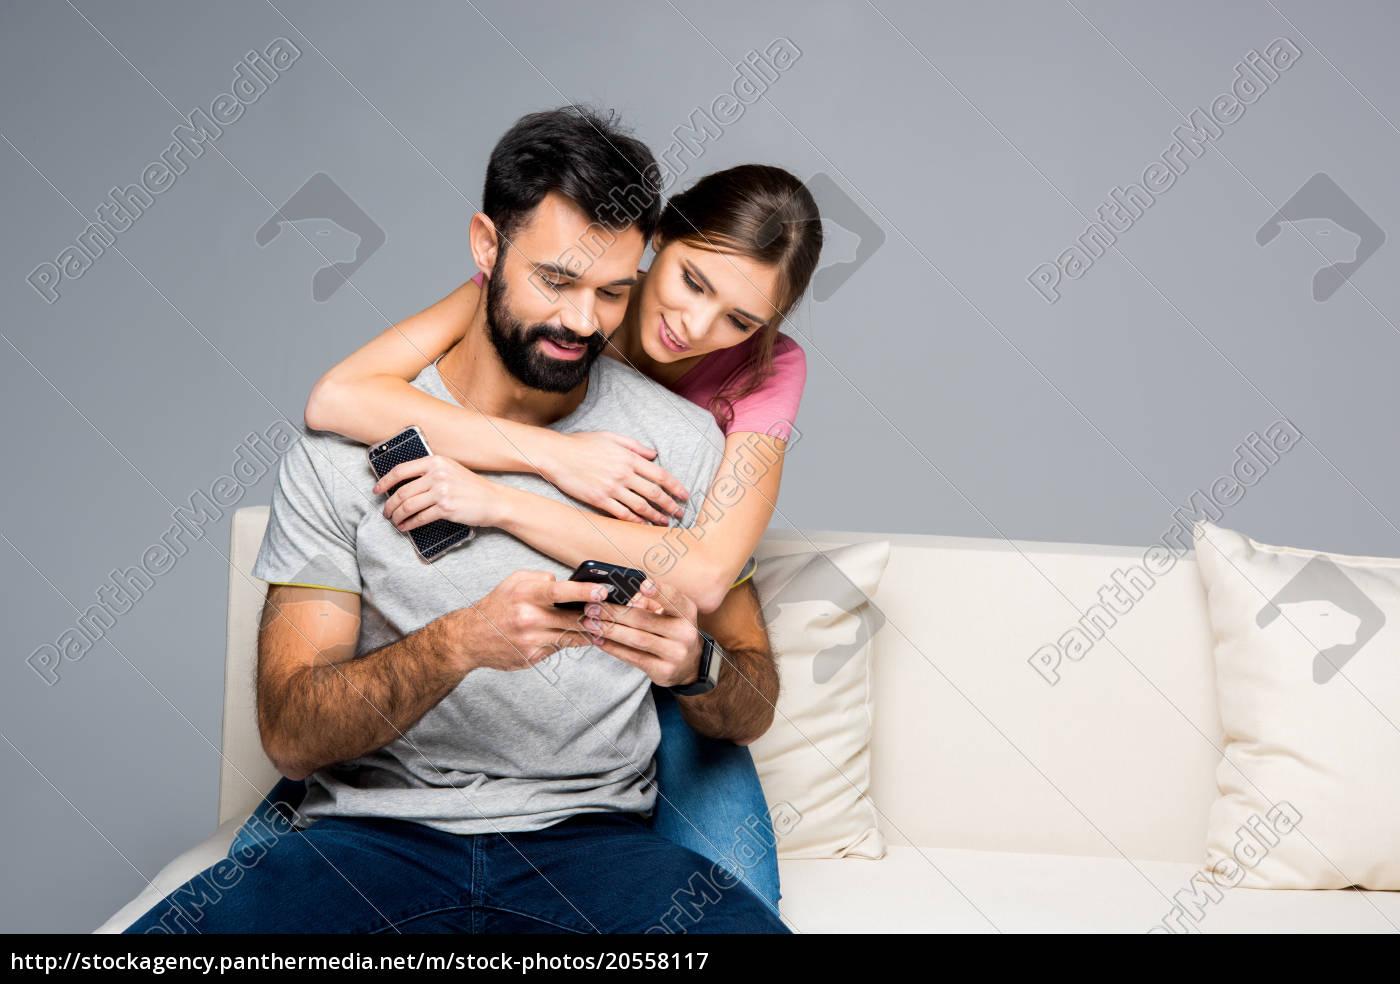 couple, using, smartphones - 20558117